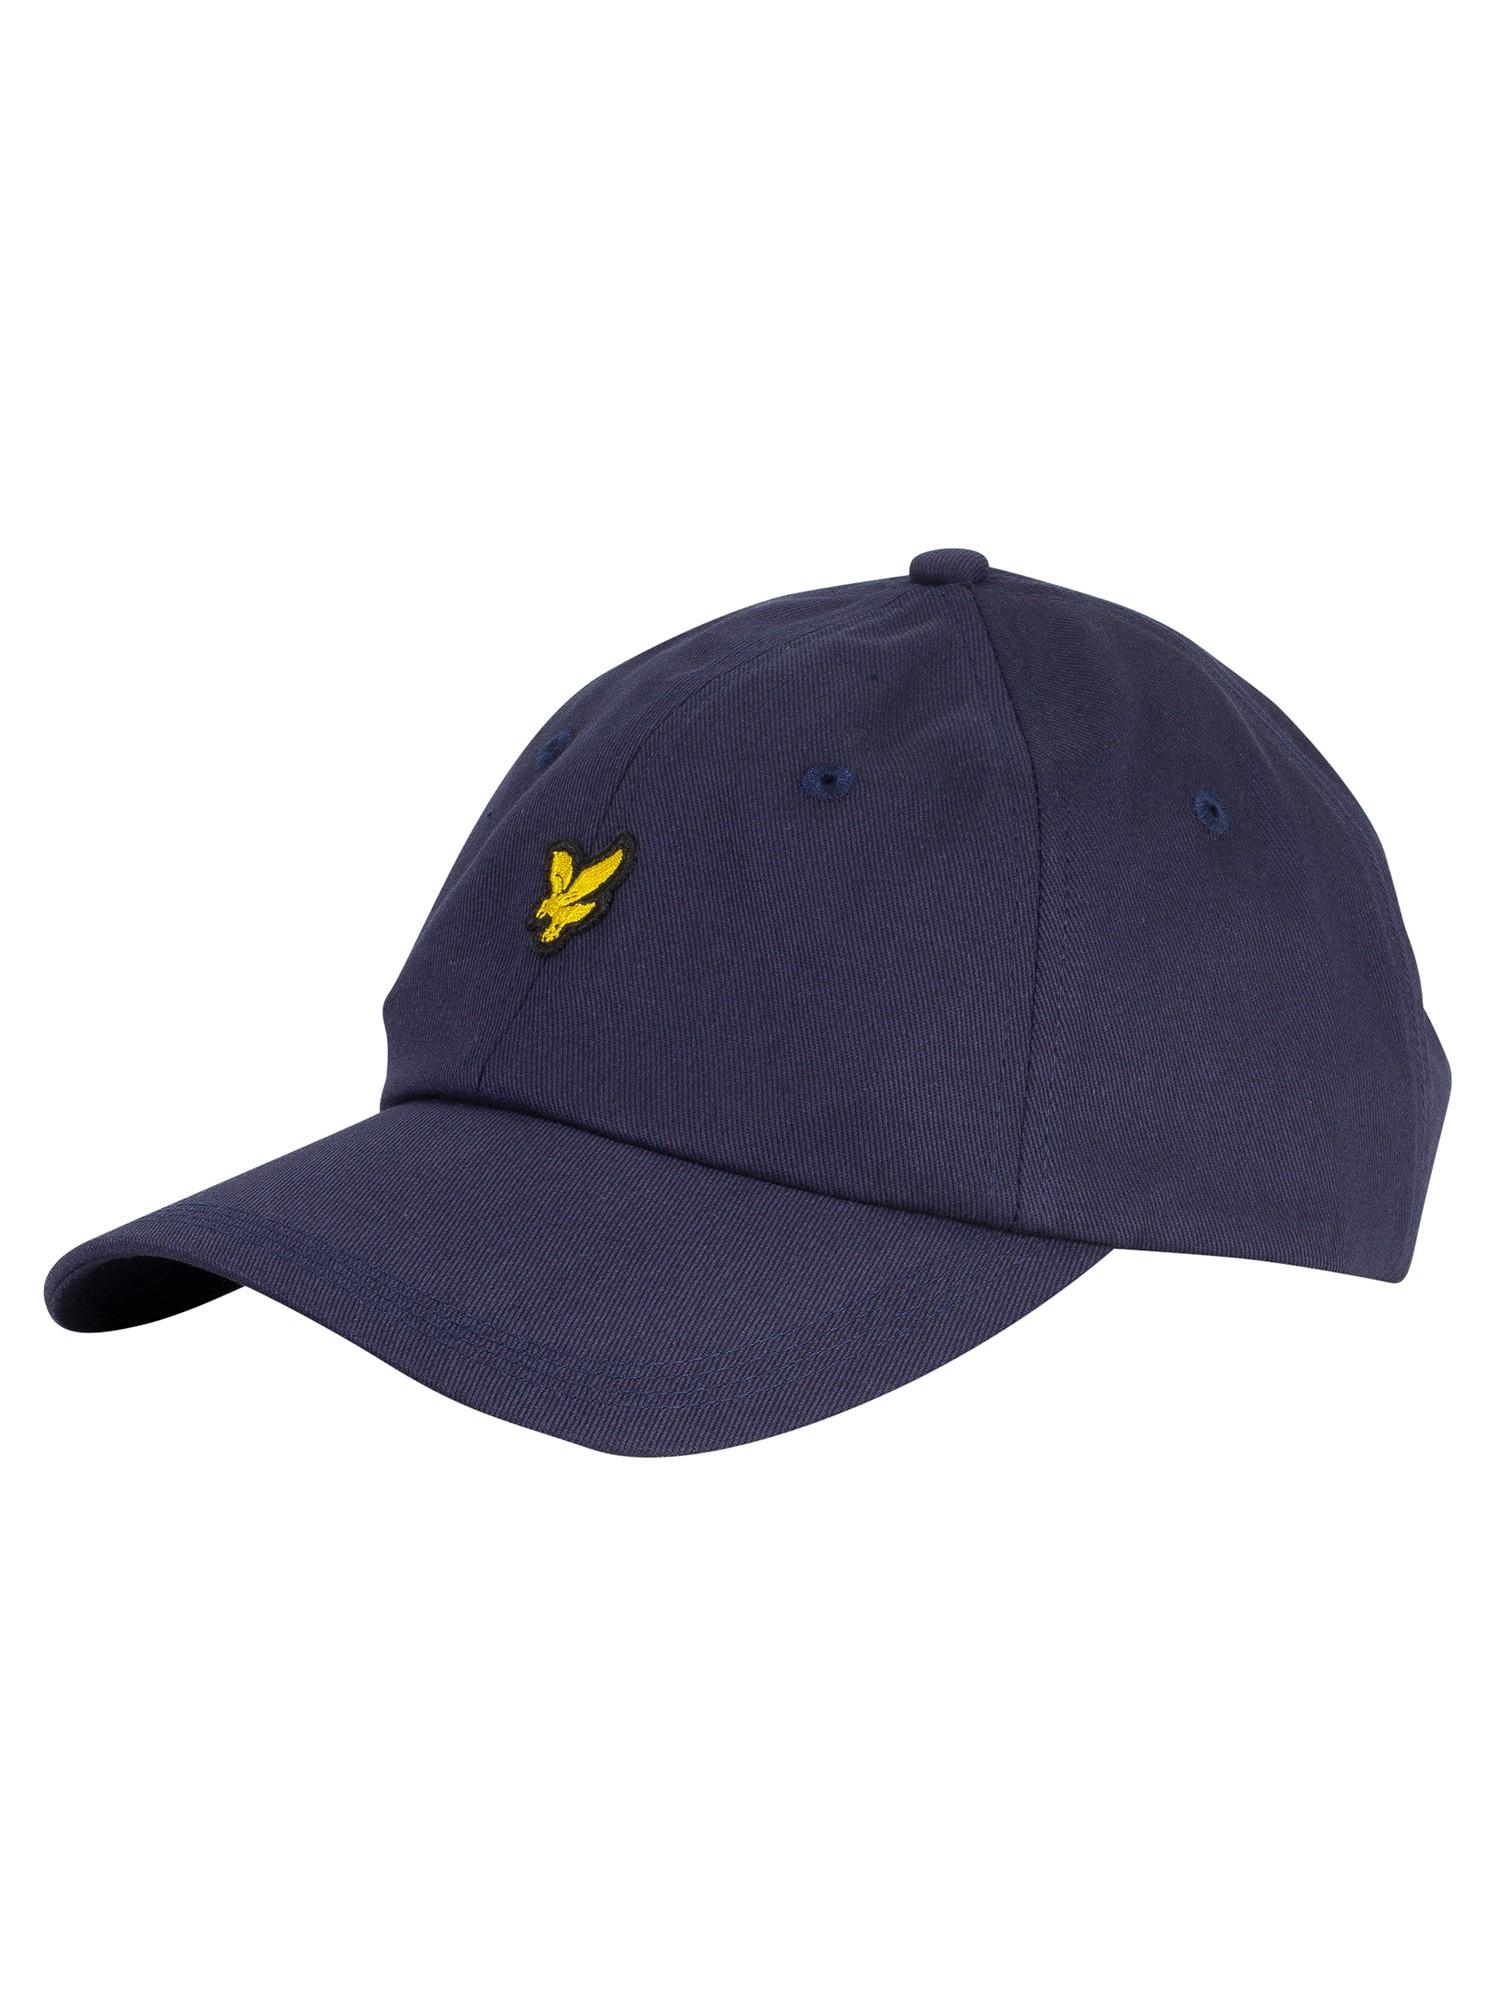 Cotton-Twill-Baseball-Cap